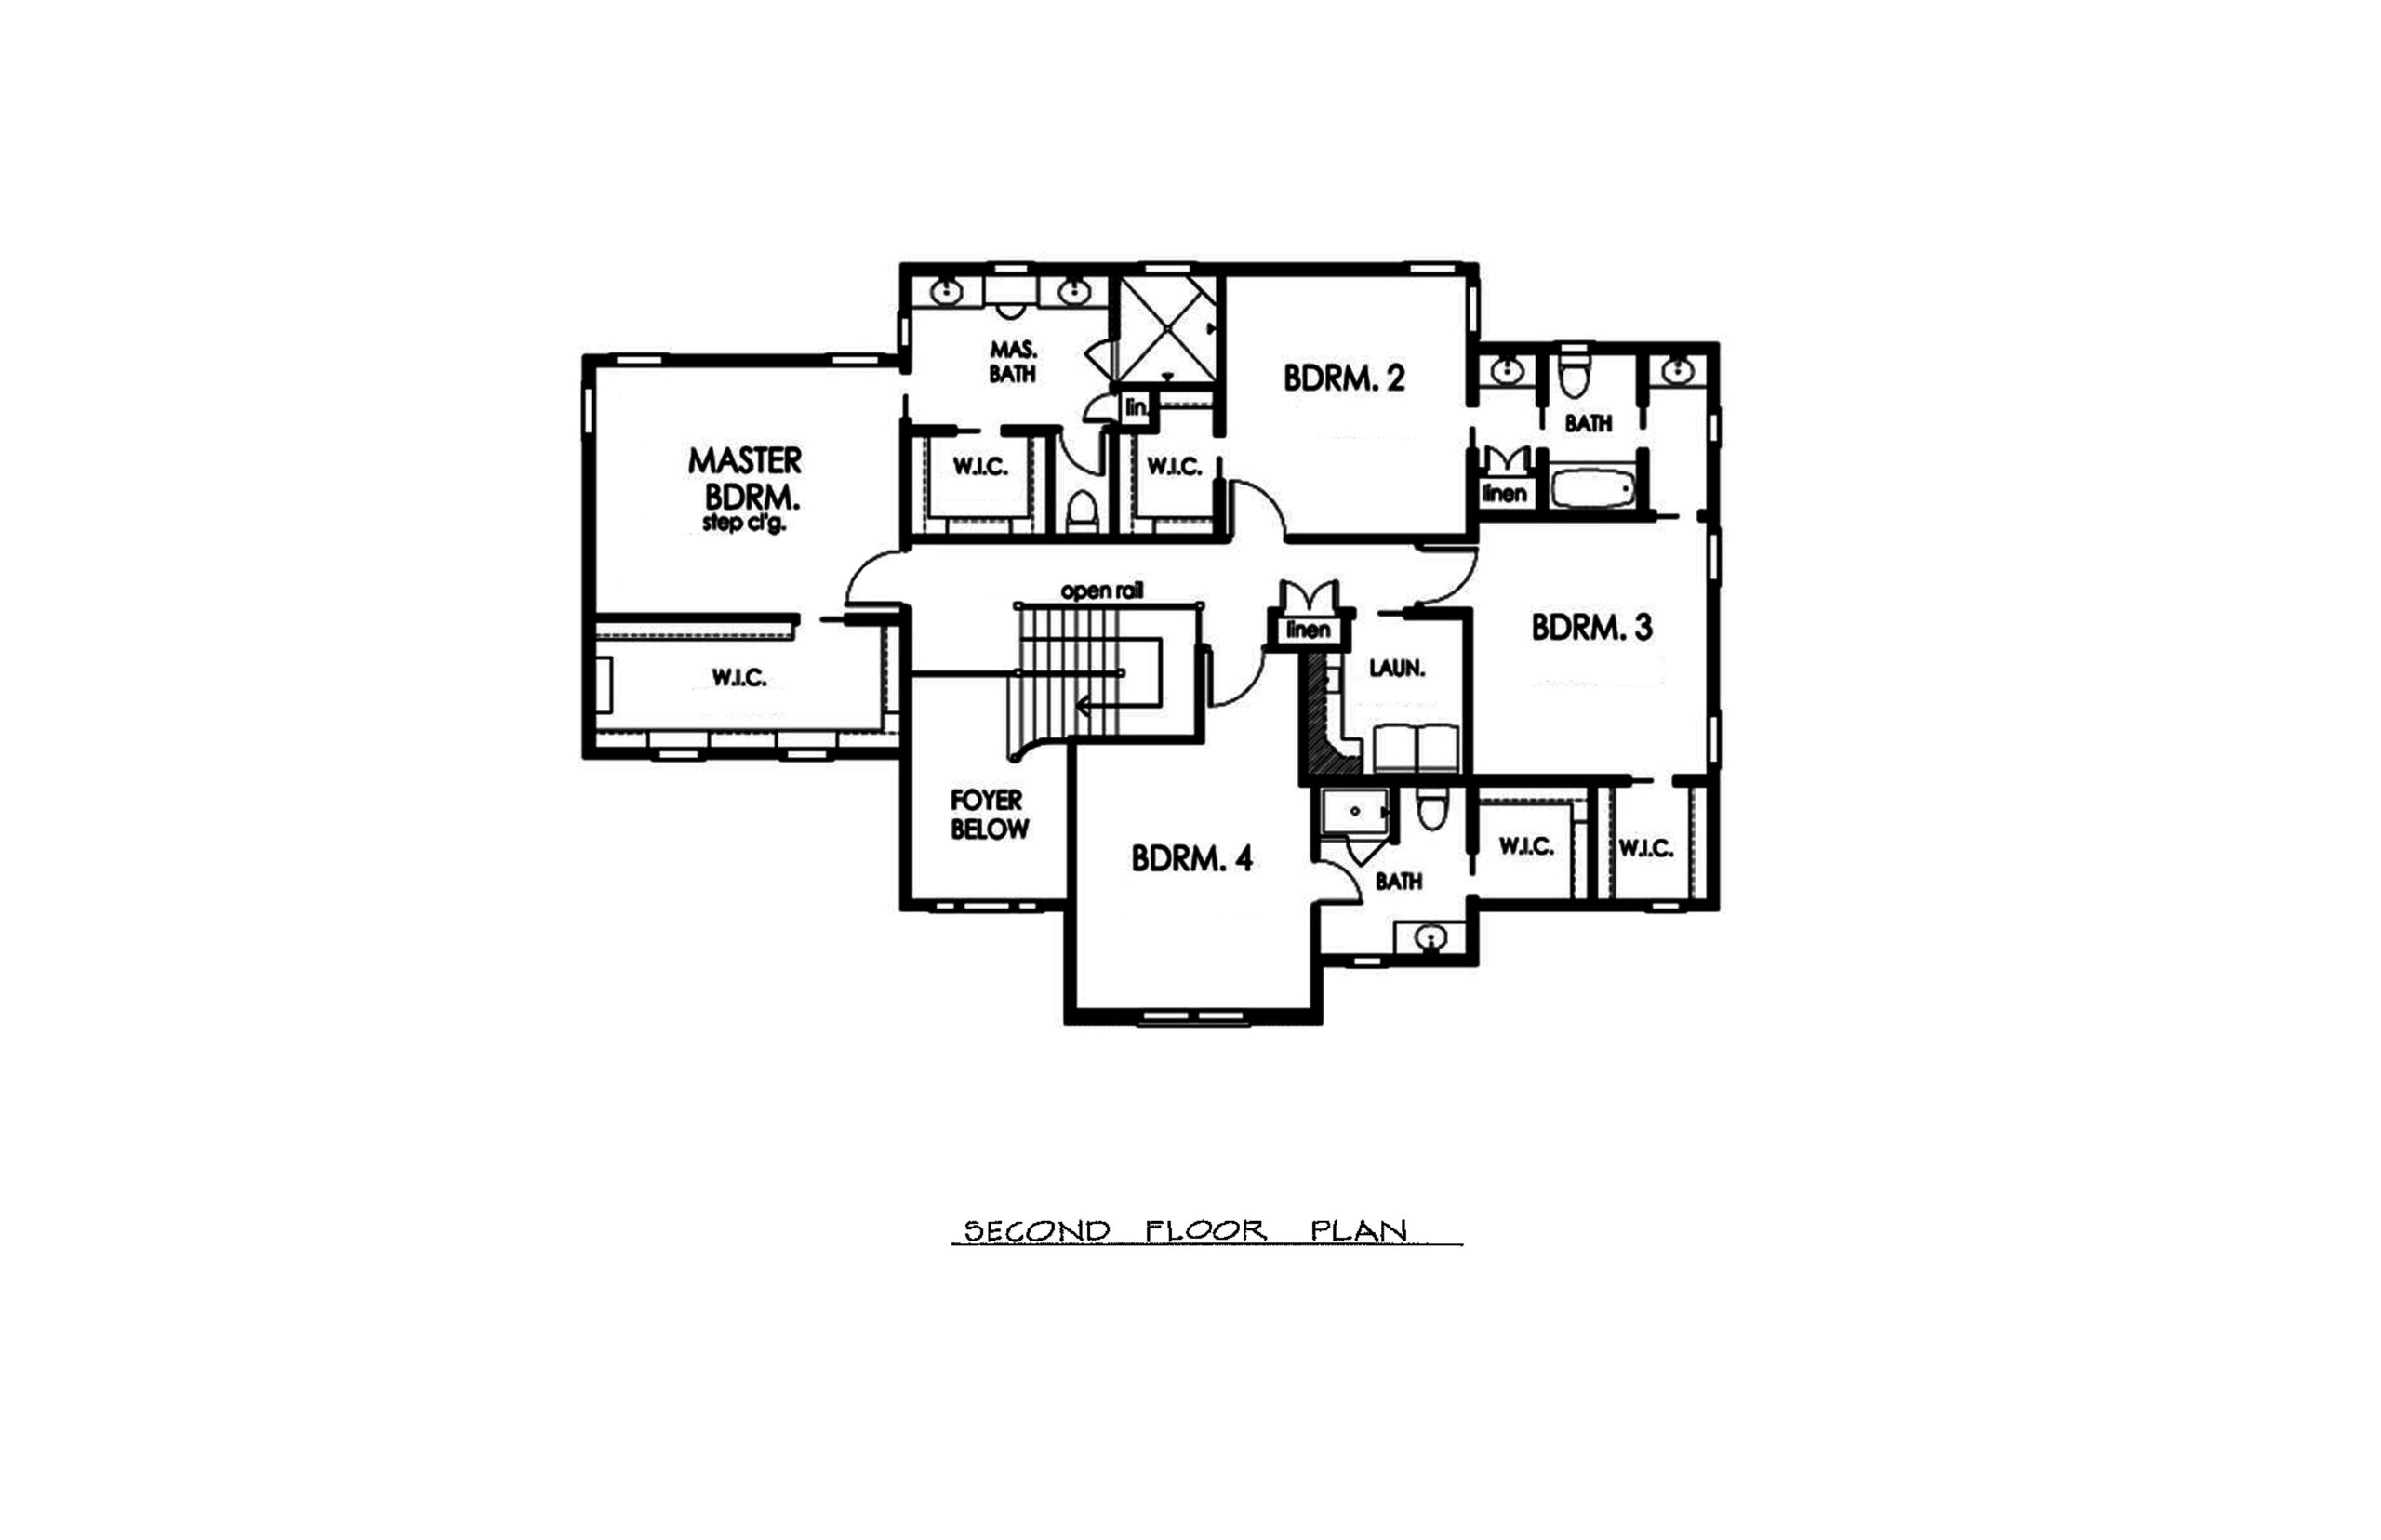 The Colt 3900 Sqft Plan 2nd Floor